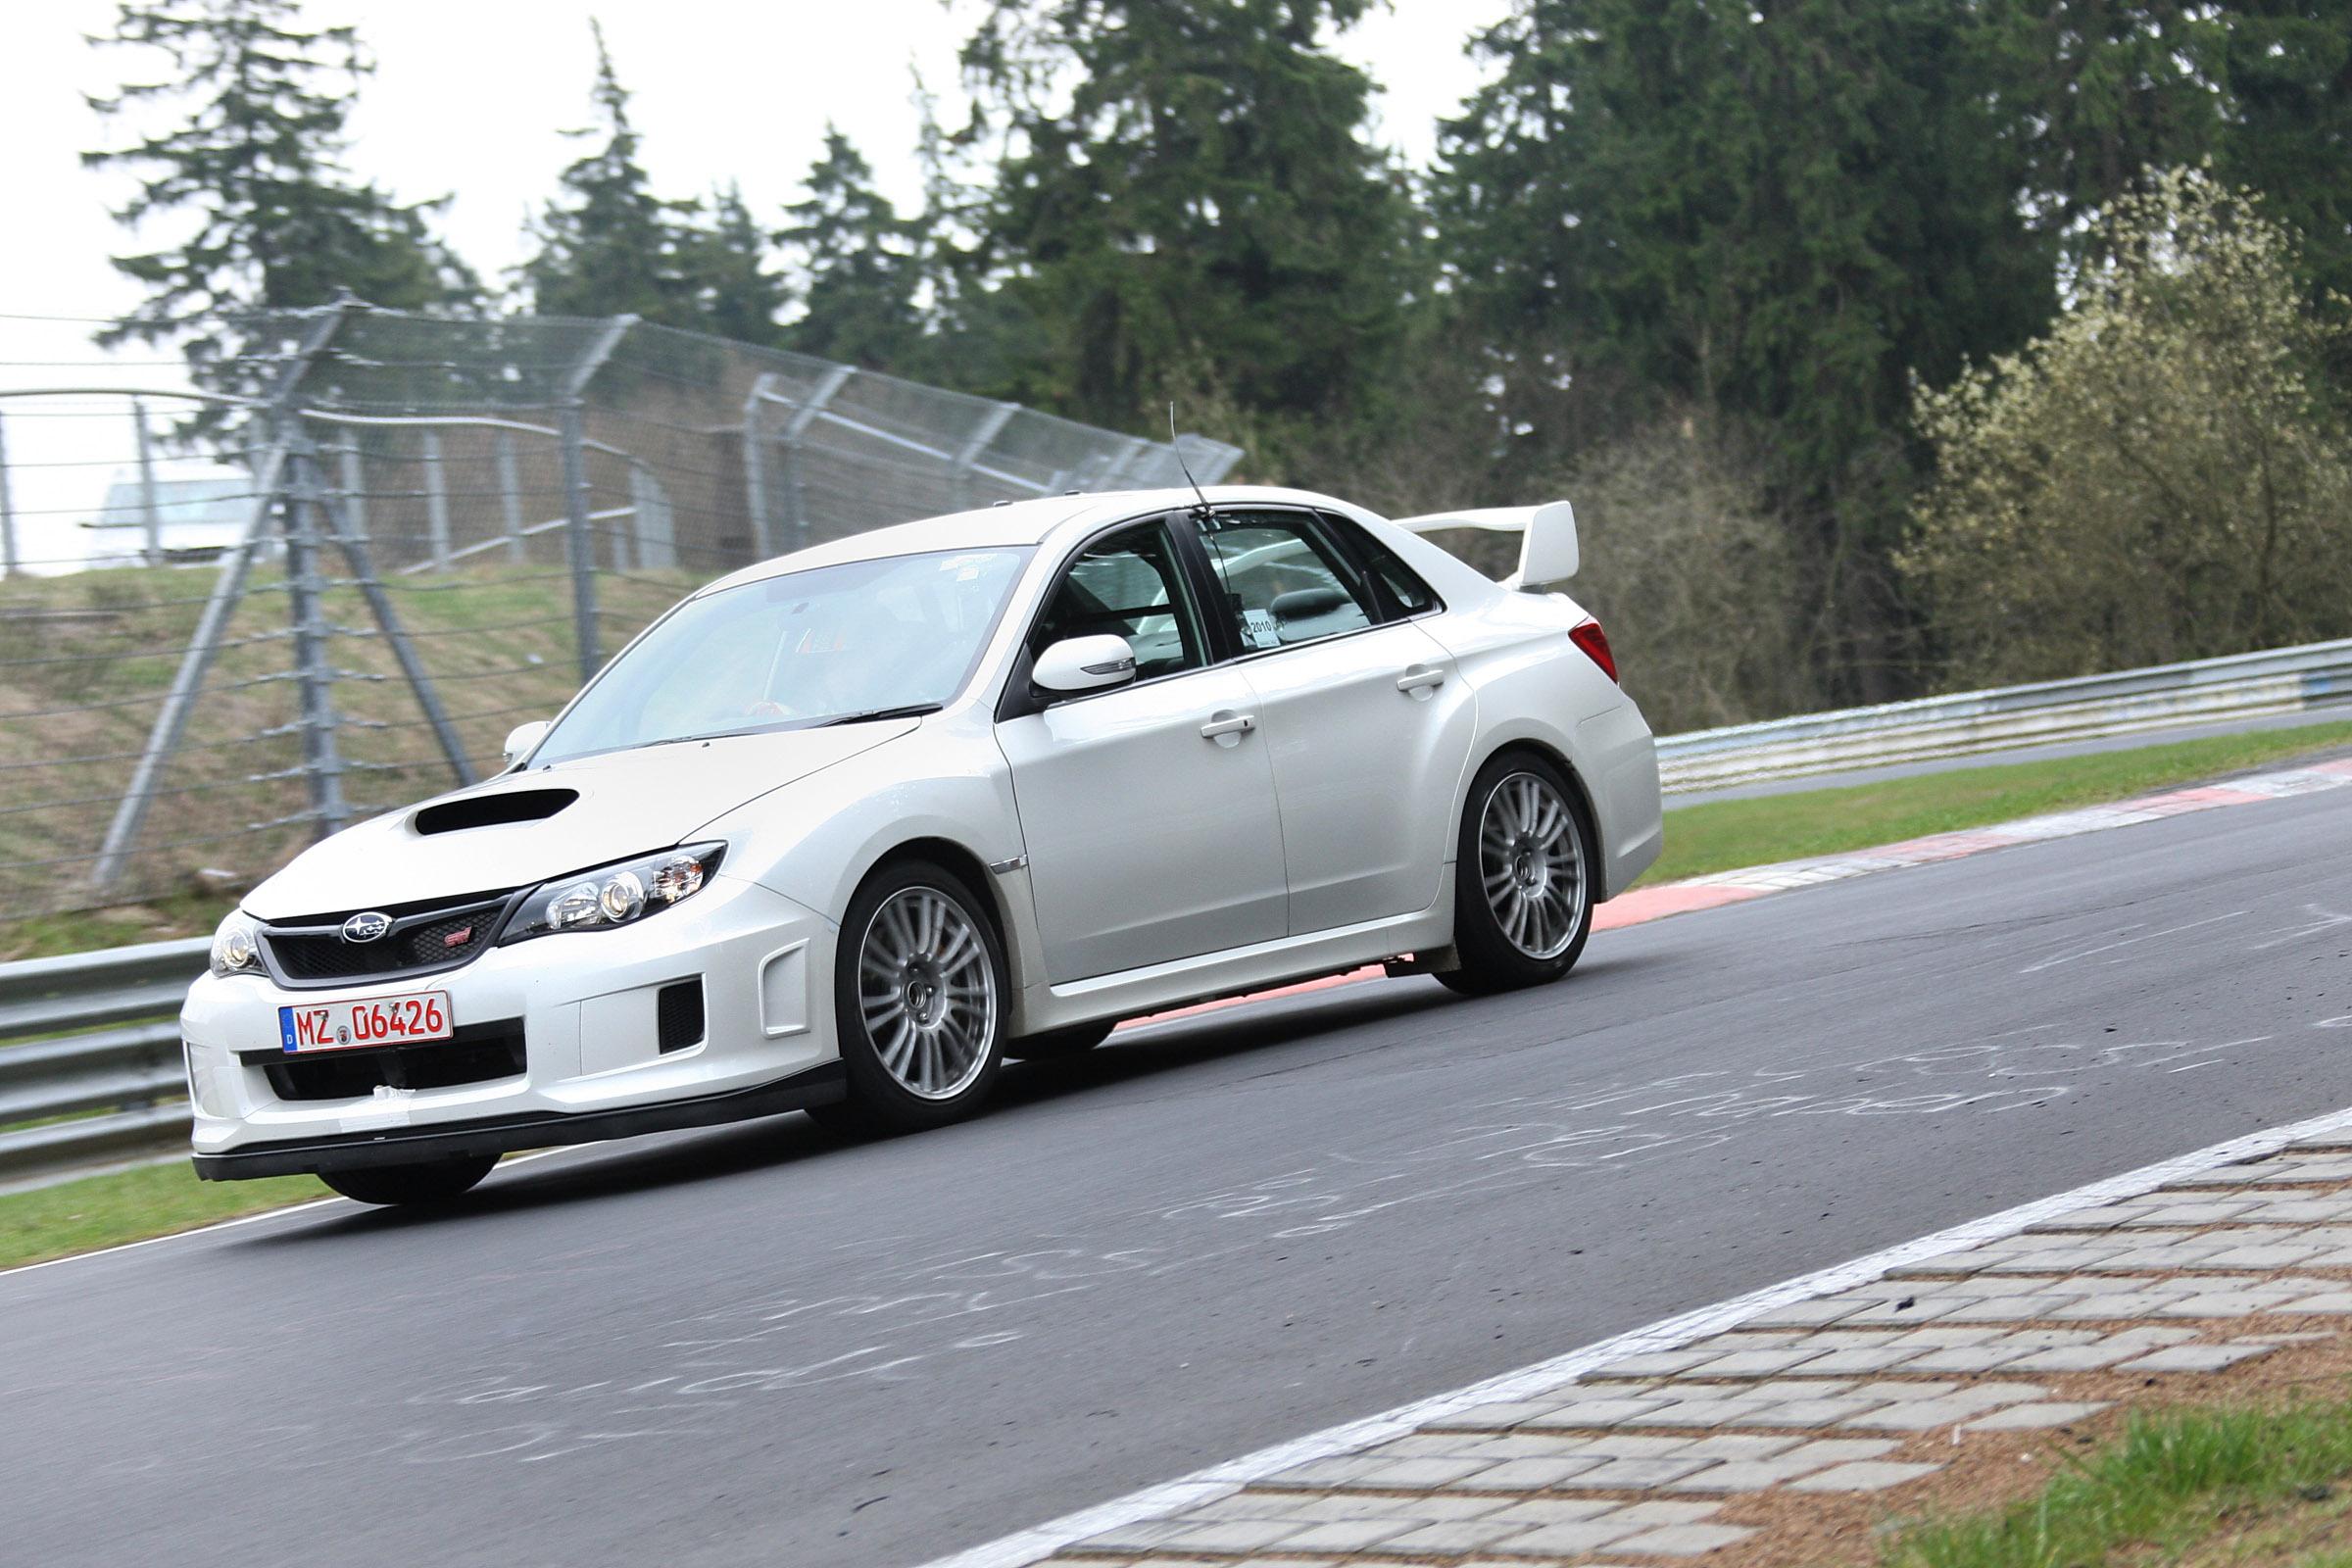 2011 Subaru WRX STi седан испытания на Нюрбургринге - фотография №12